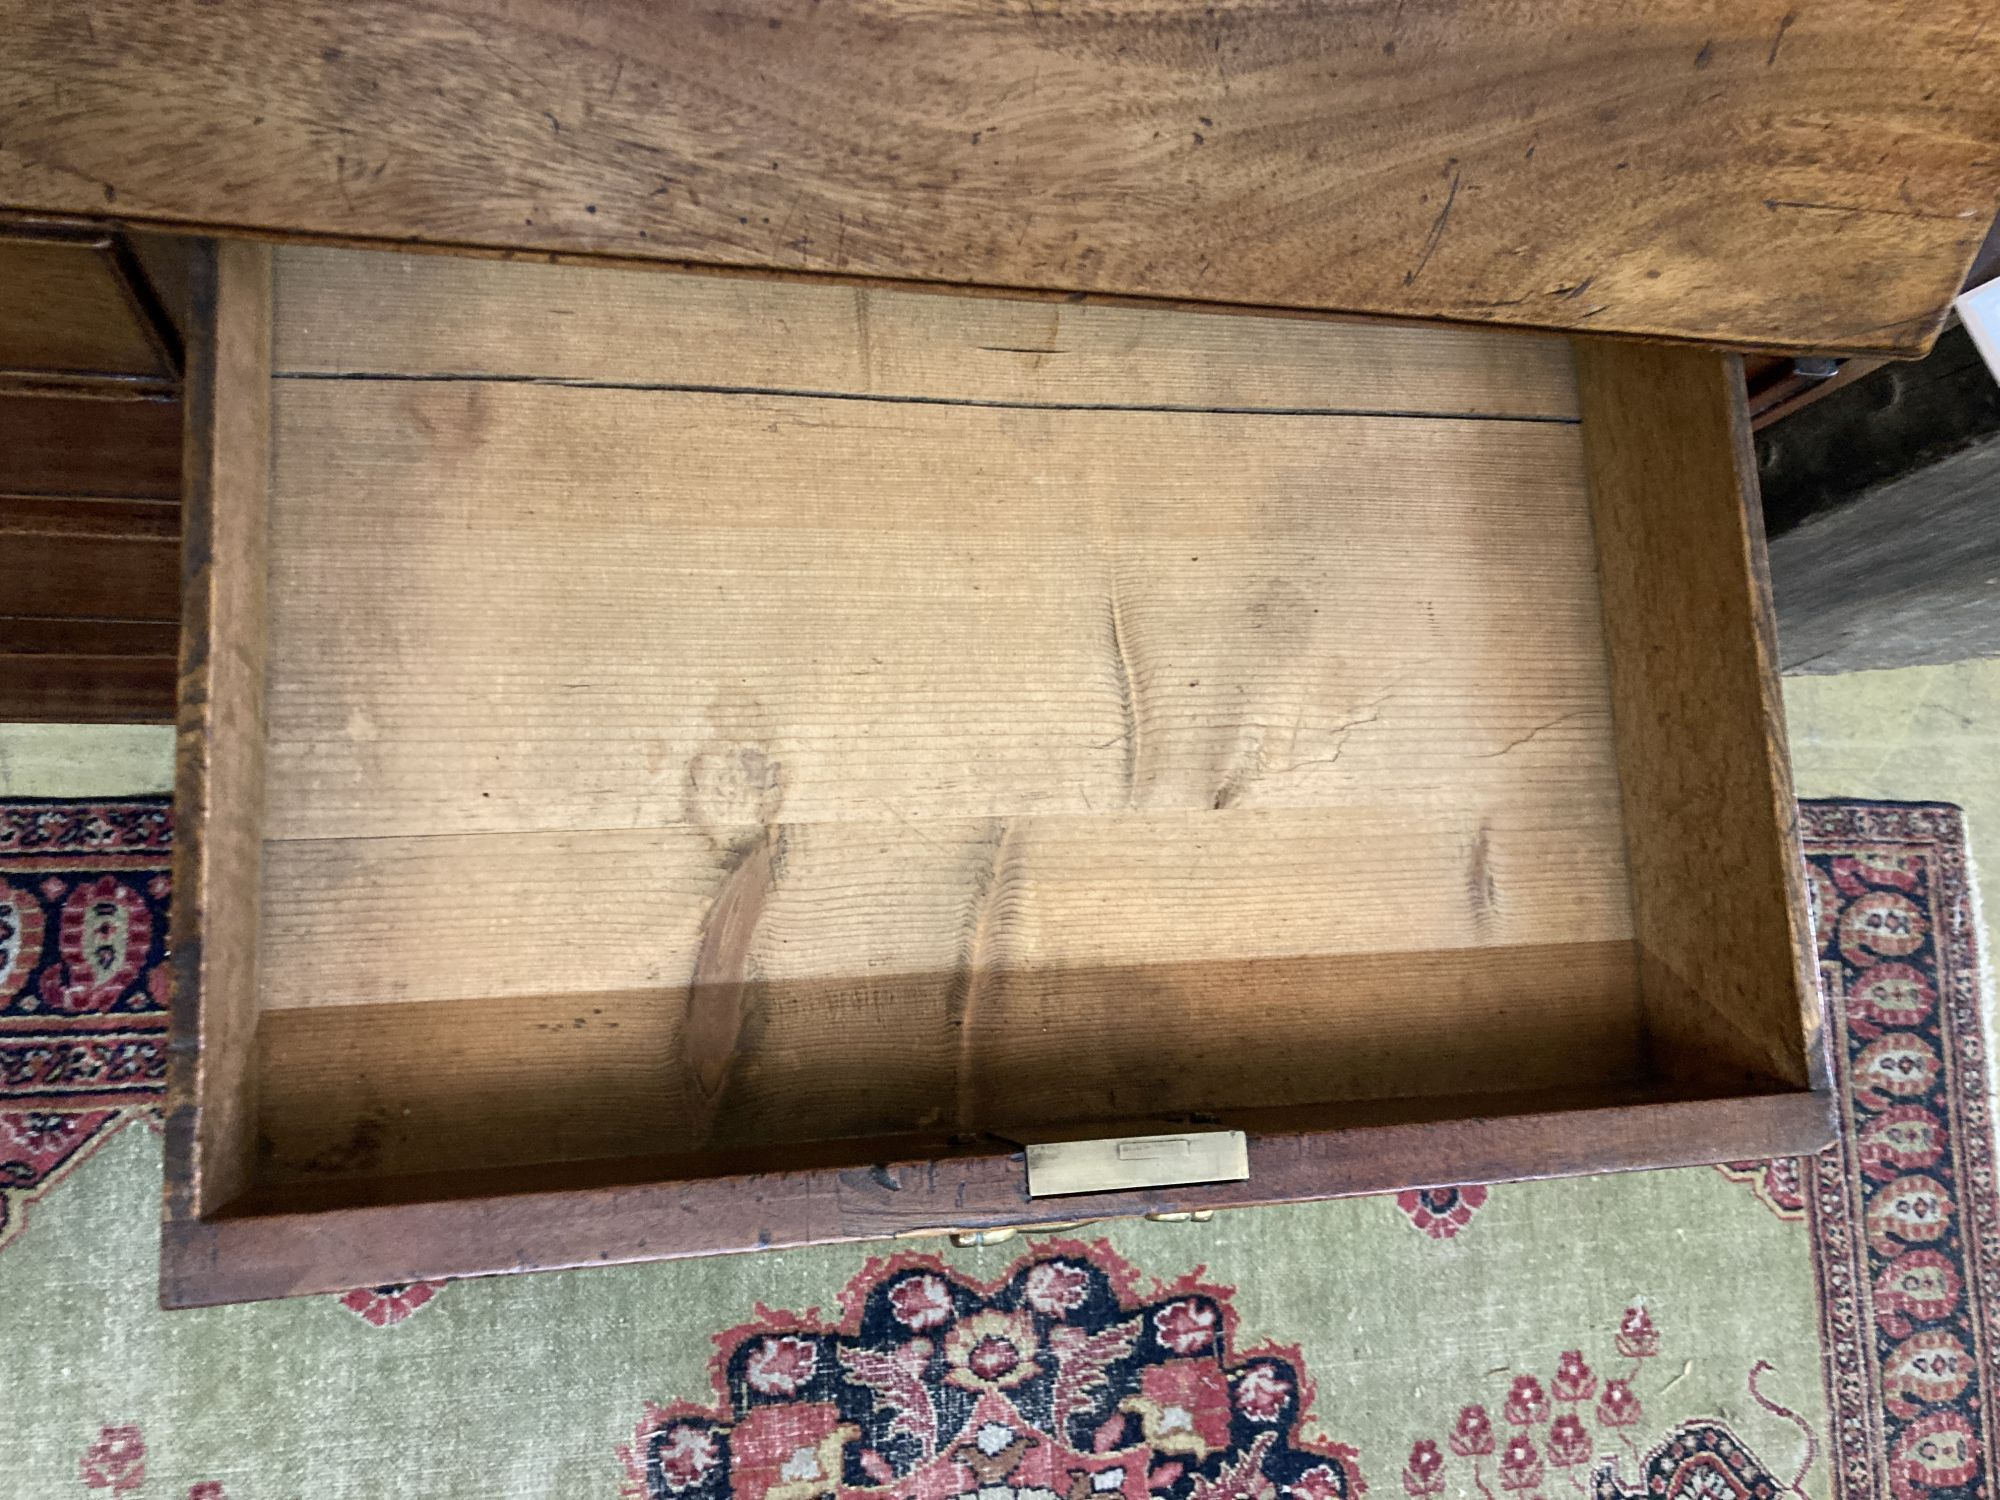 A George III mahogany bureau, width 117cm depth 51cm height 117cm - Image 3 of 3